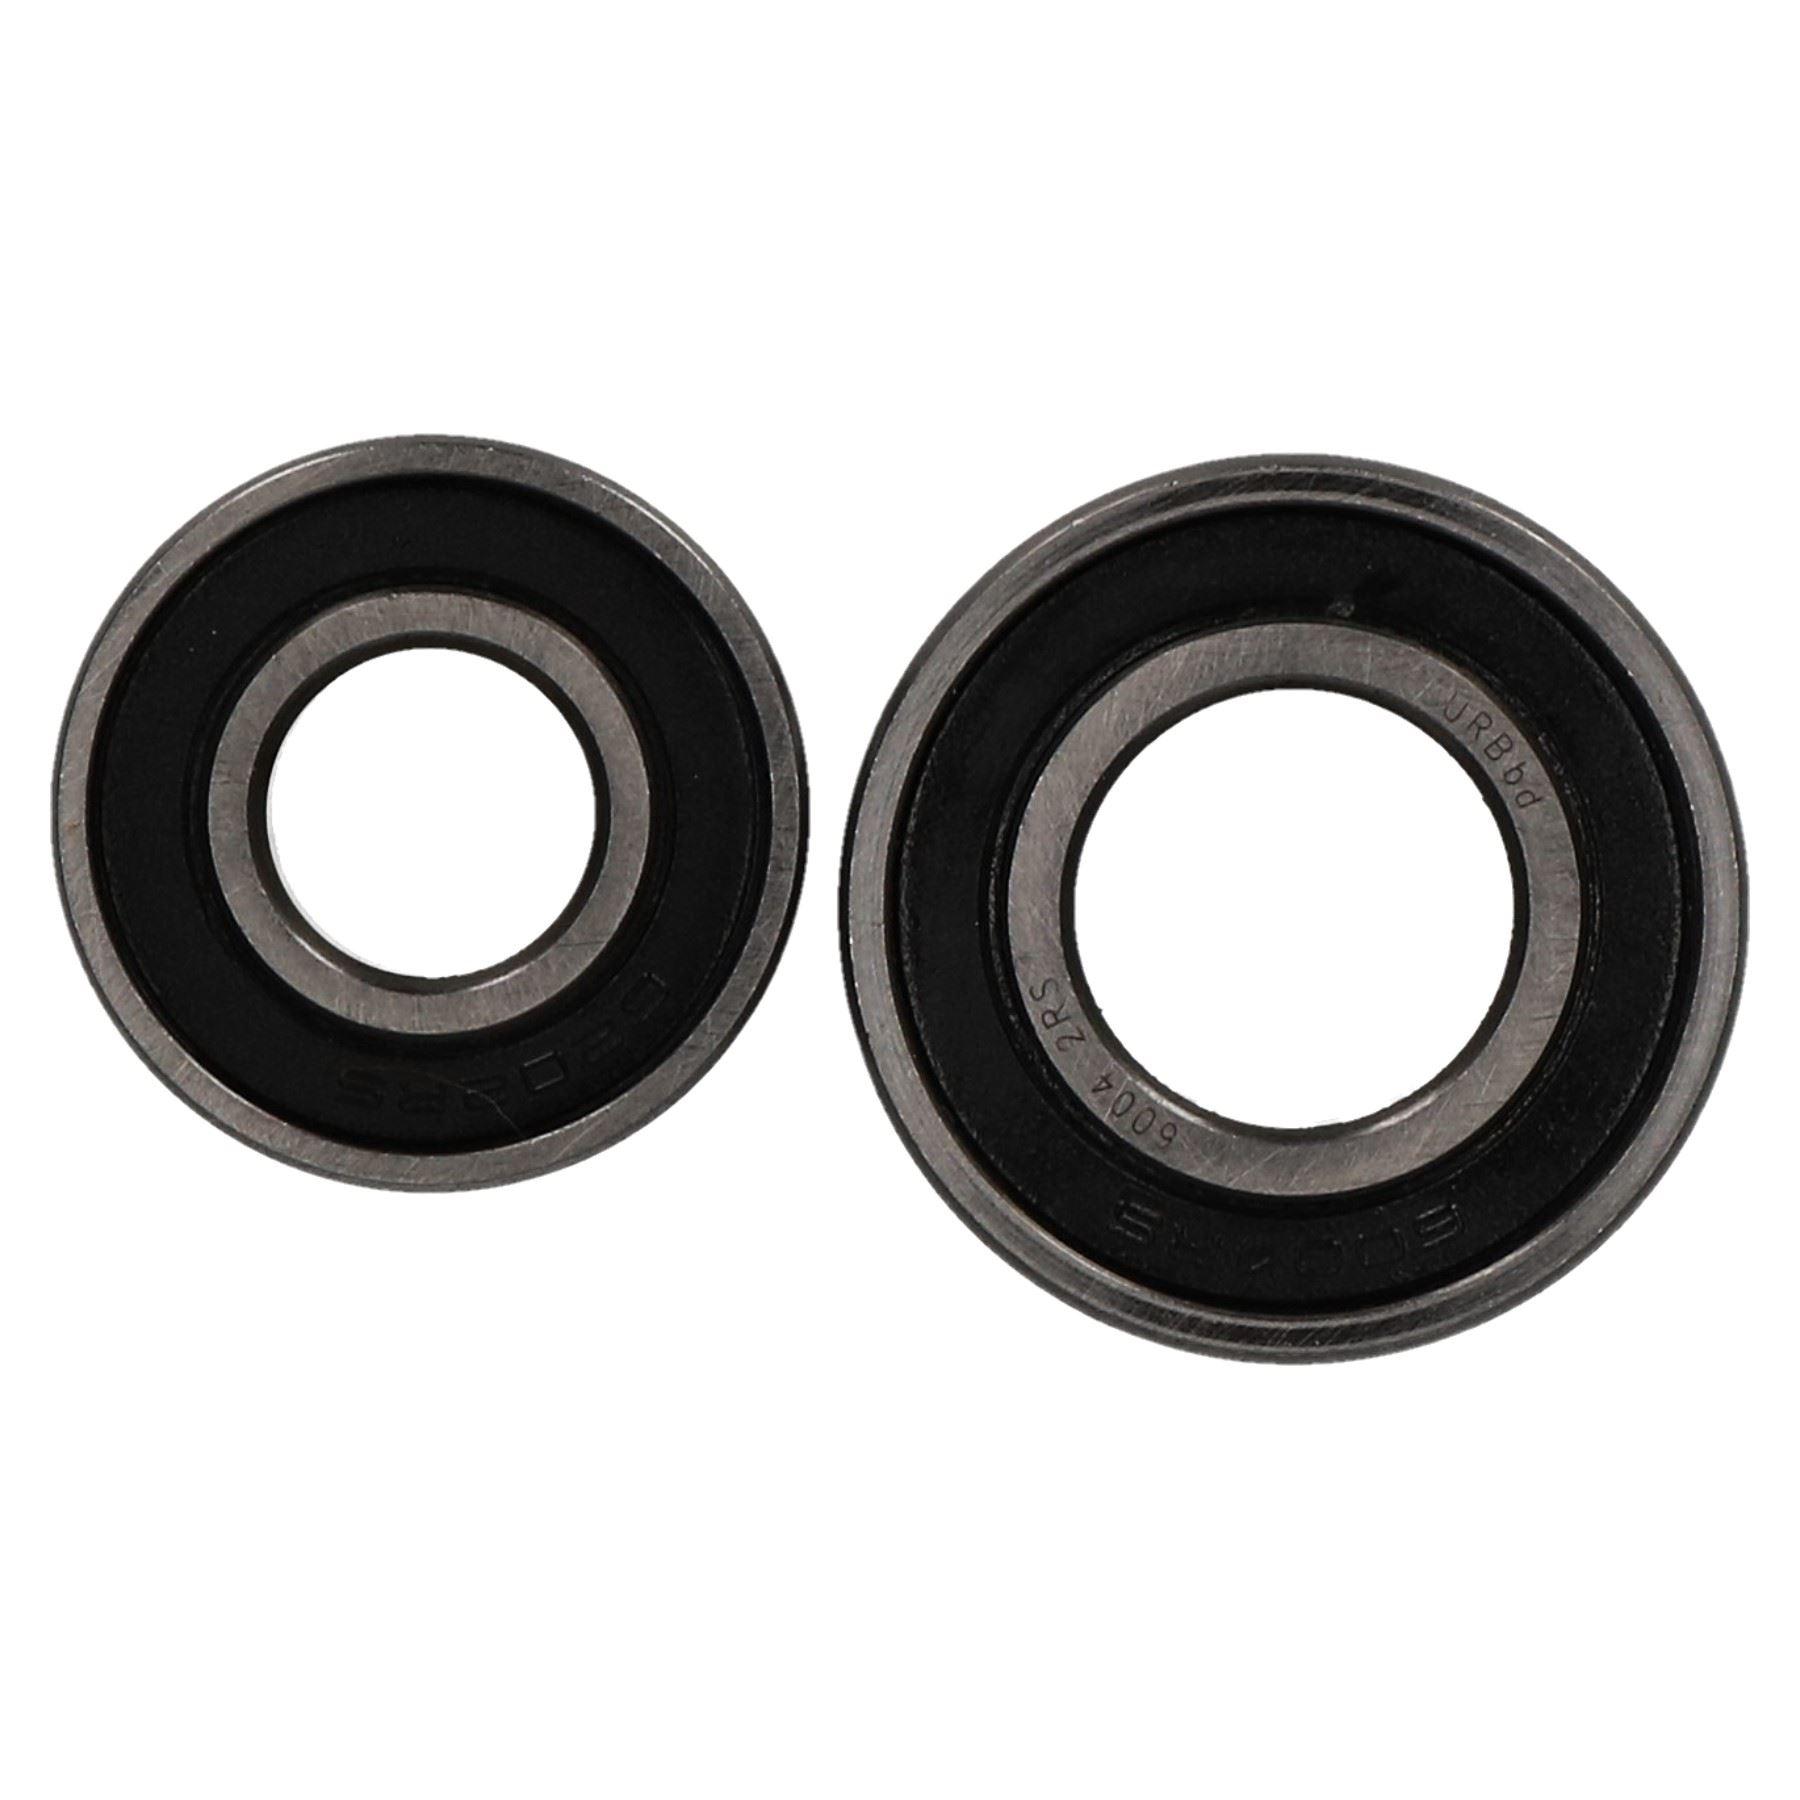 4-ERDE-102-121-122-Trailer-Roller-Wheel-Hub-Bearing-Kits-6206-2RS-6004-2RS thumbnail 3